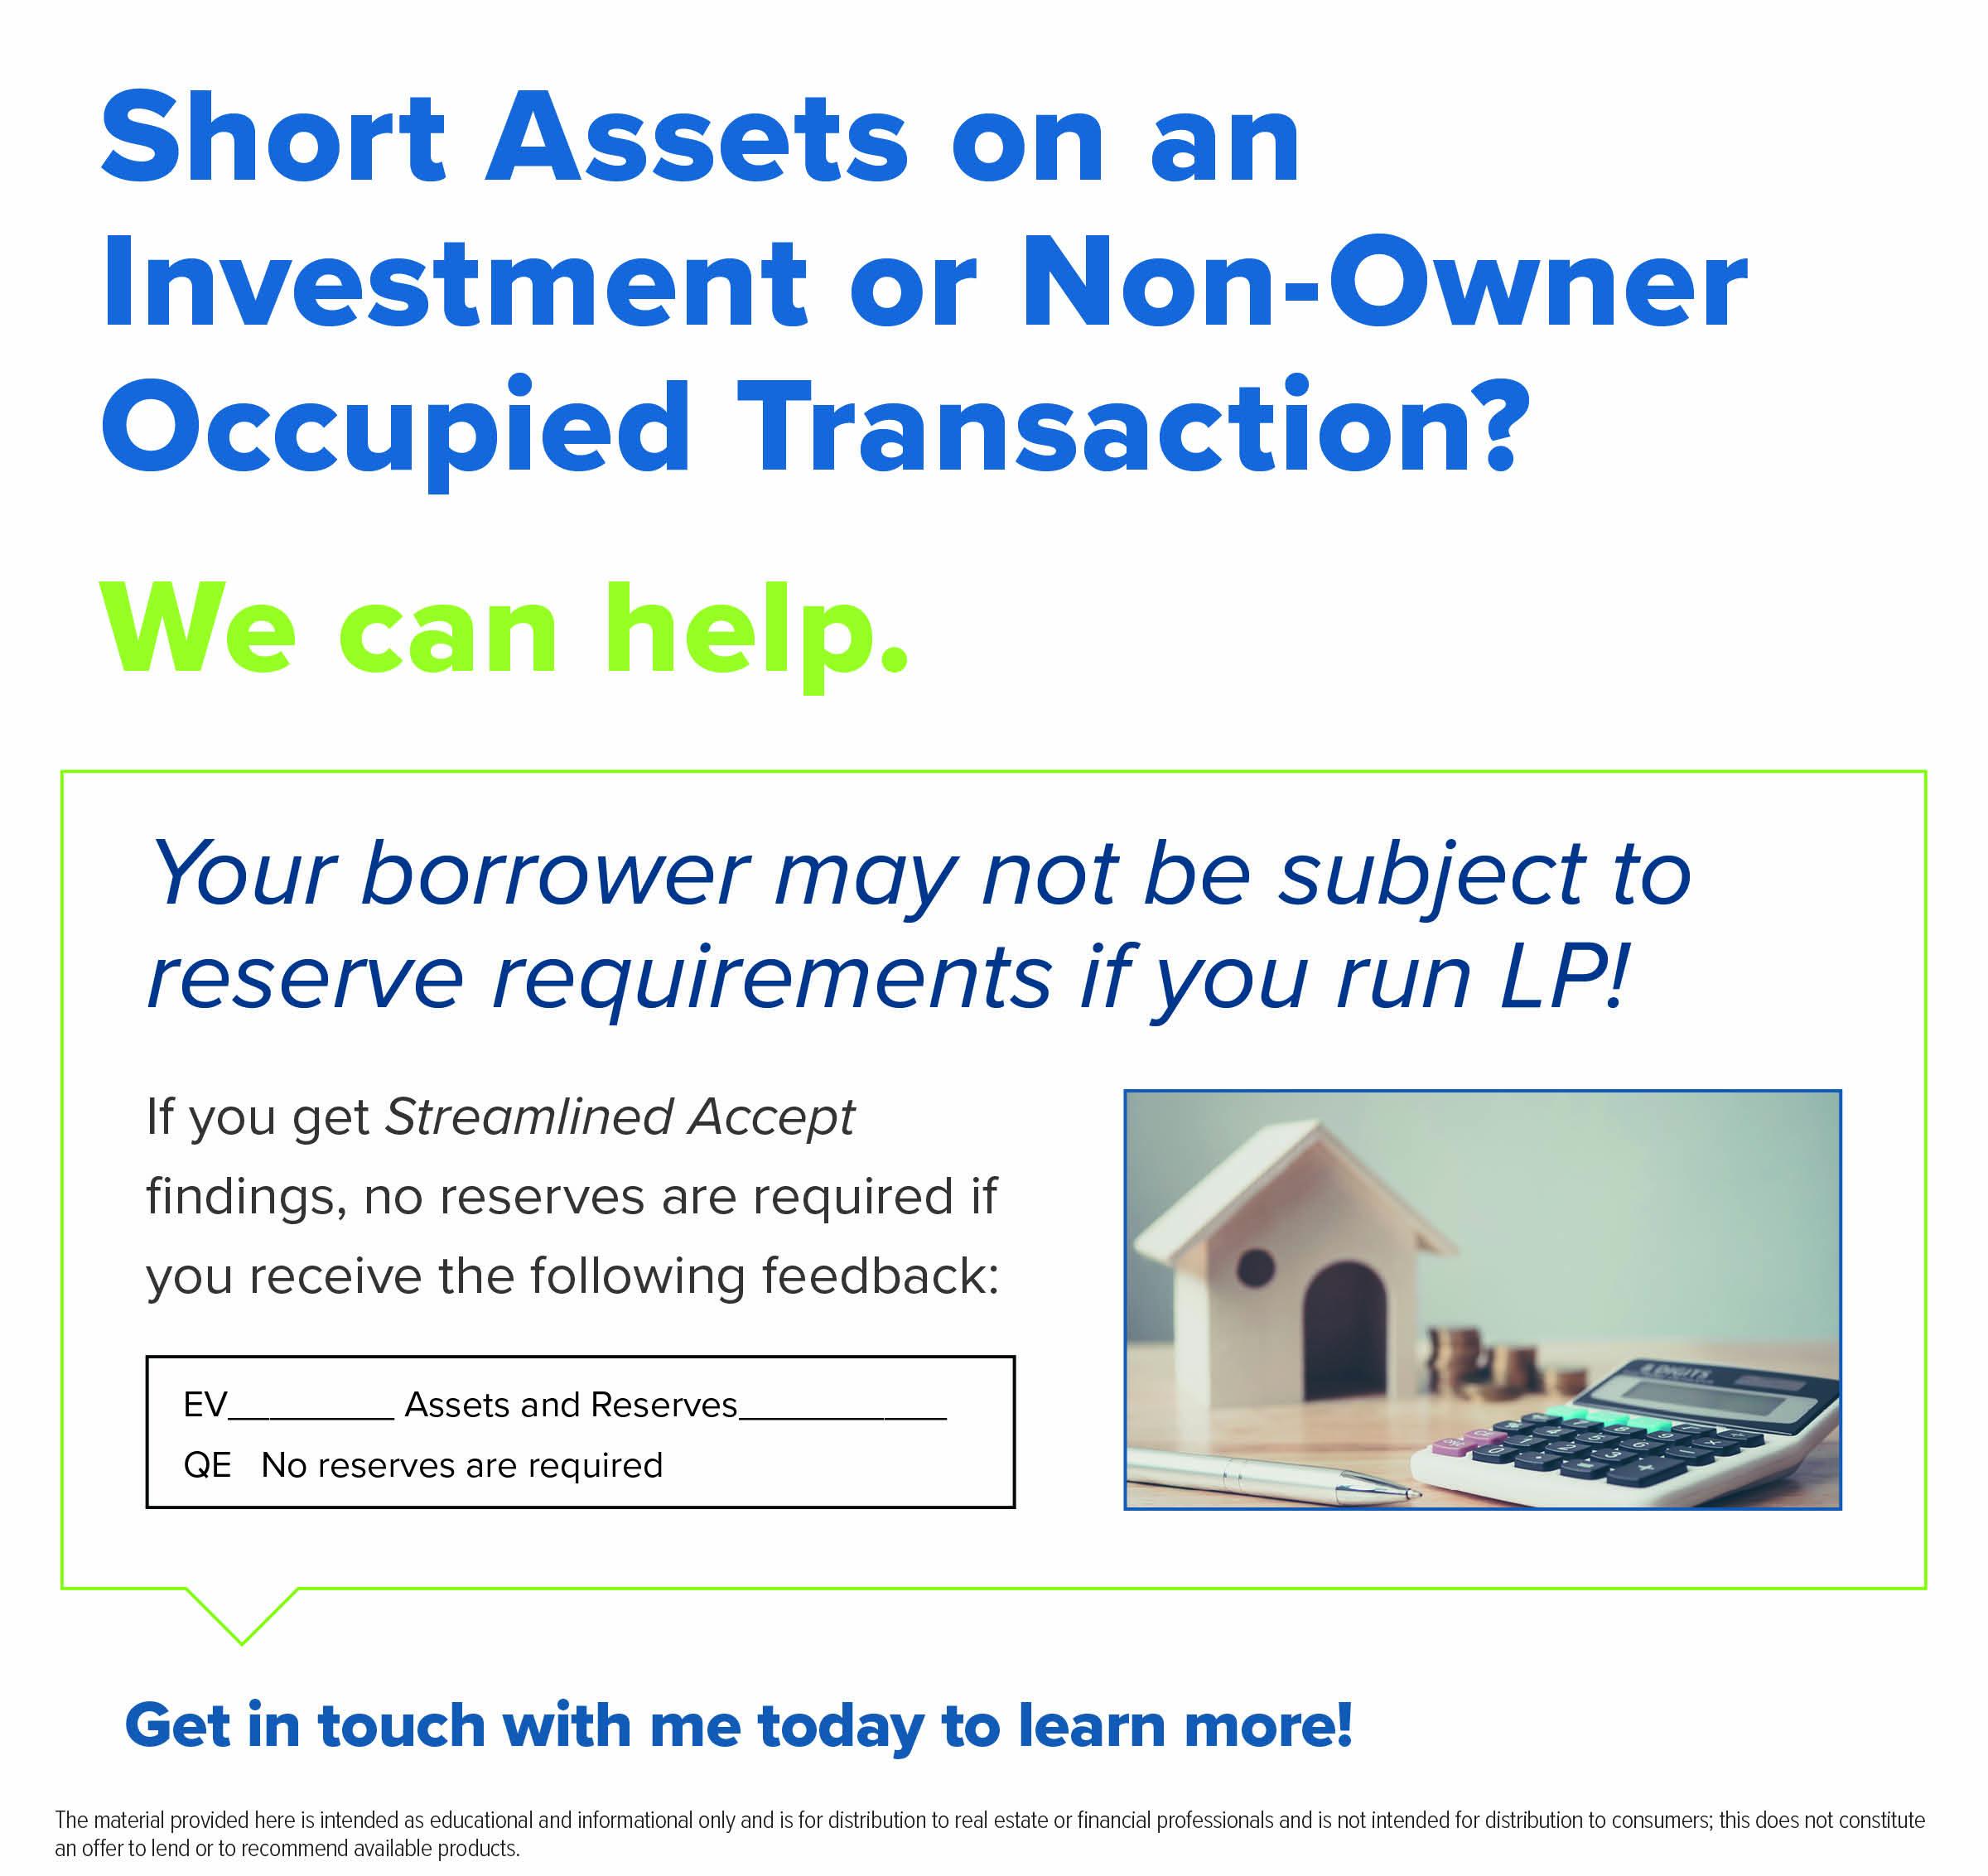 Wholesale - Short Assets - NOO Transaction - OSI.jpg